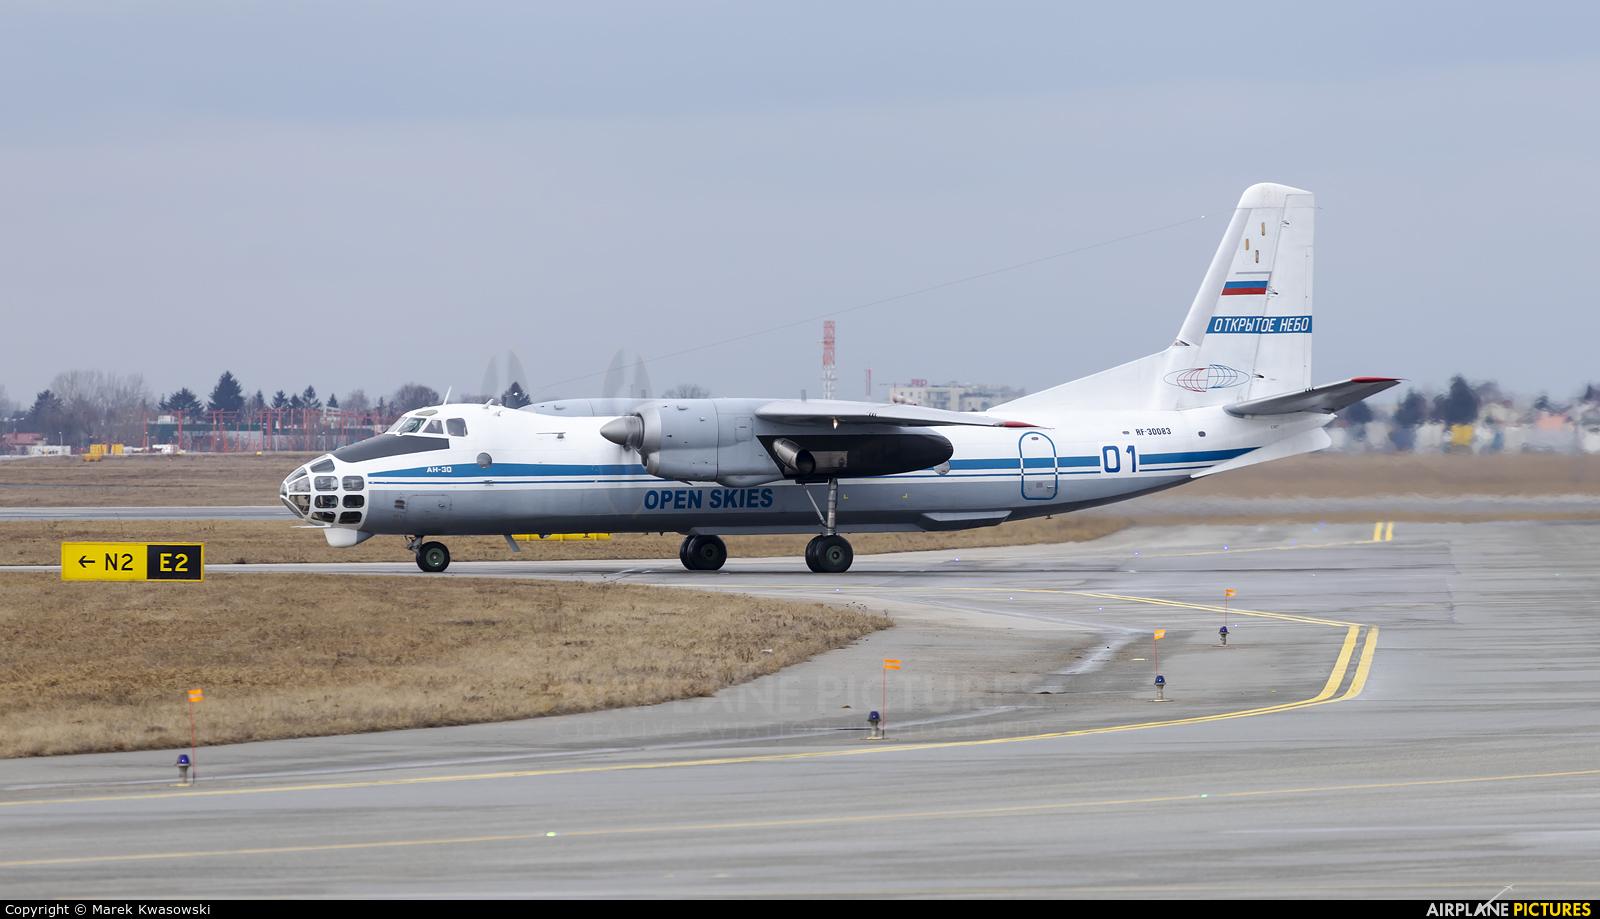 Russia - Air Force 01 aircraft at Warsaw - Frederic Chopin